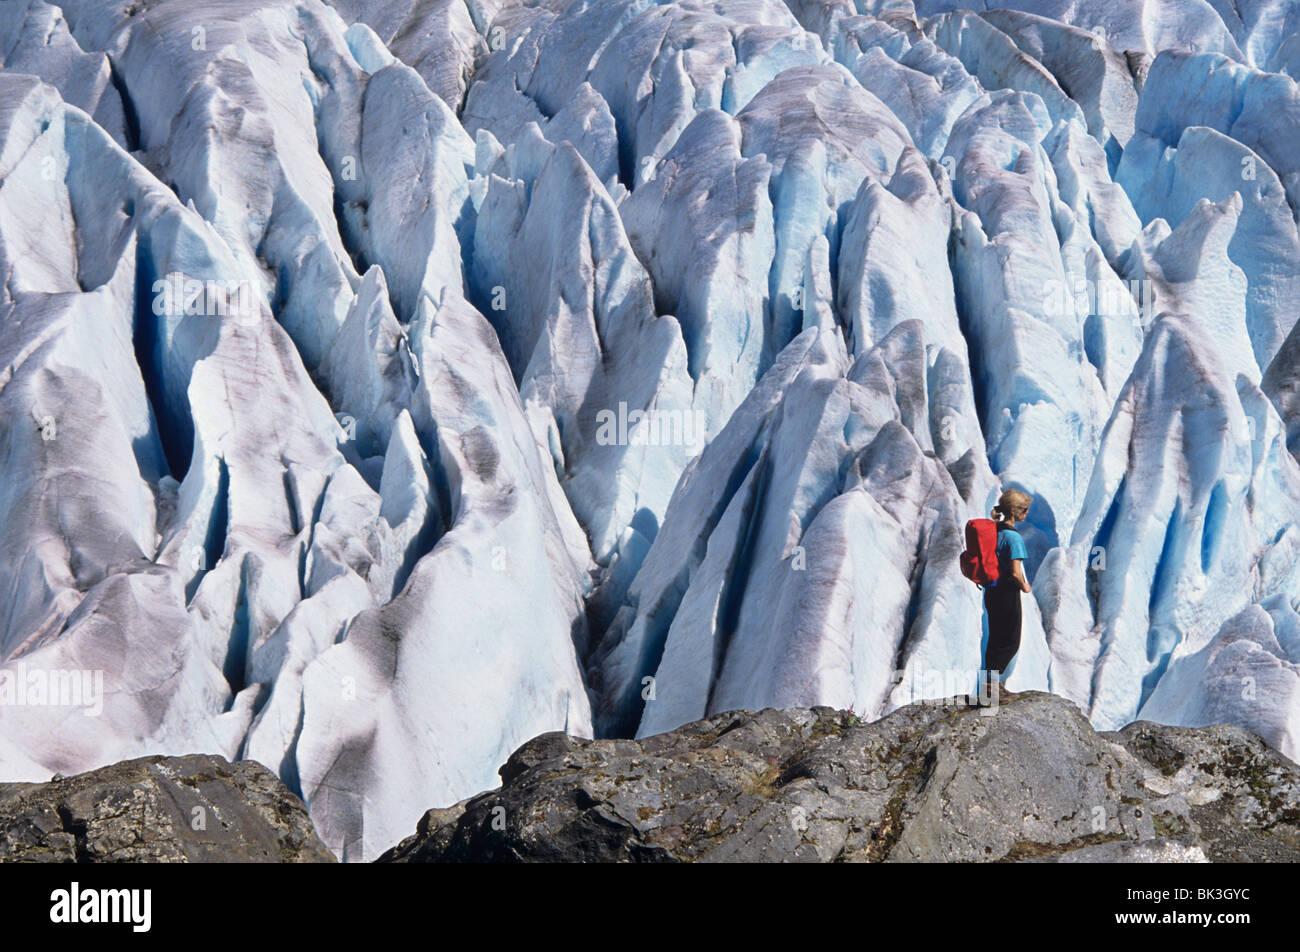 Woman standing on rock overlooking seracs on Mendenhall Glacier outside town of Juneau, Alaska. Stock Photo